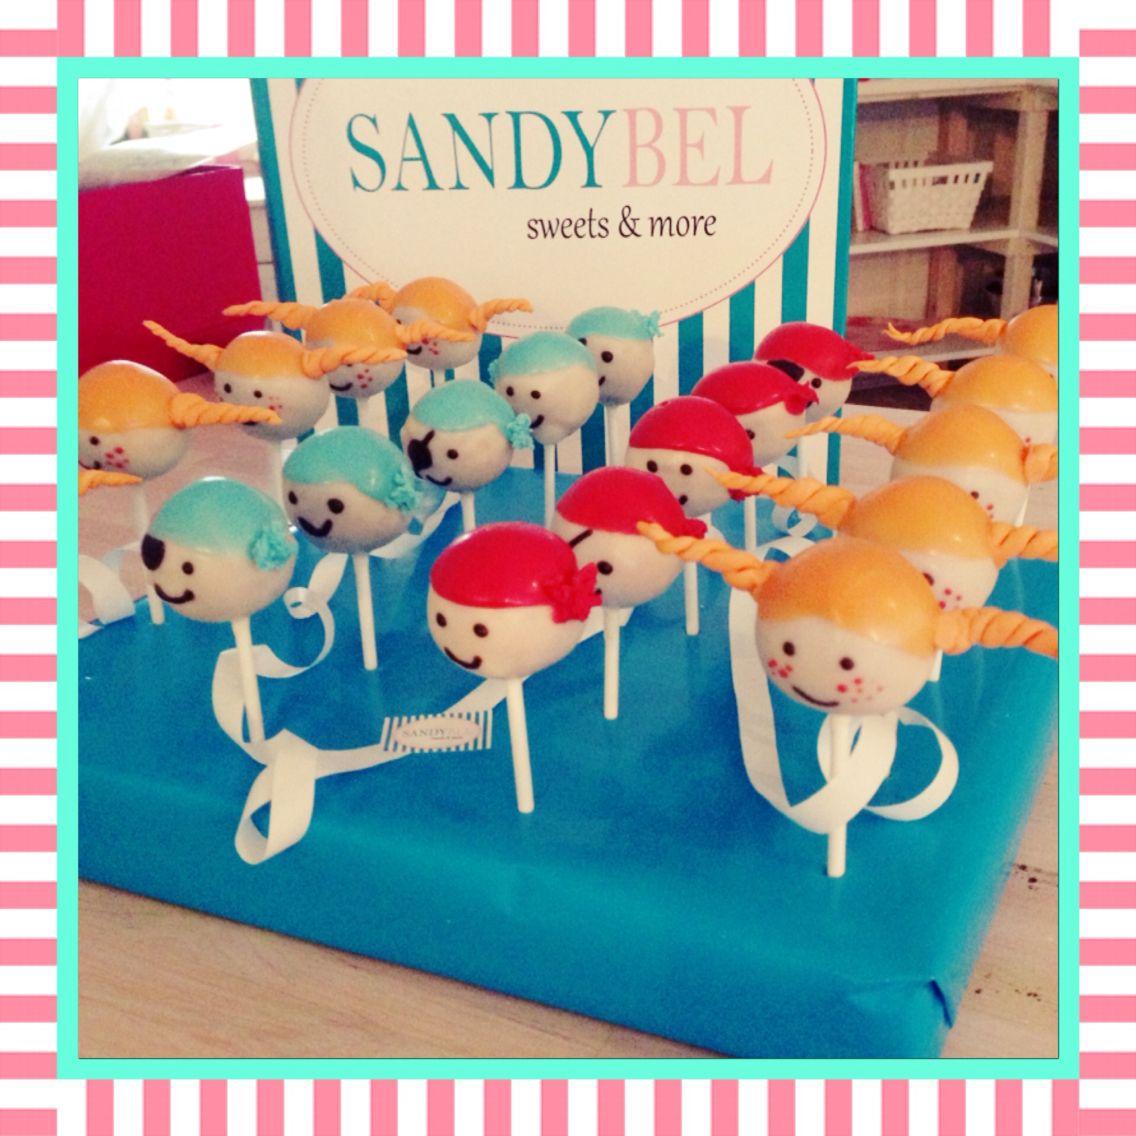 Pippi Langstrumpf Und Piraten Cakepops By Sandybel Piraten Pippilangstrumpf Sweets More